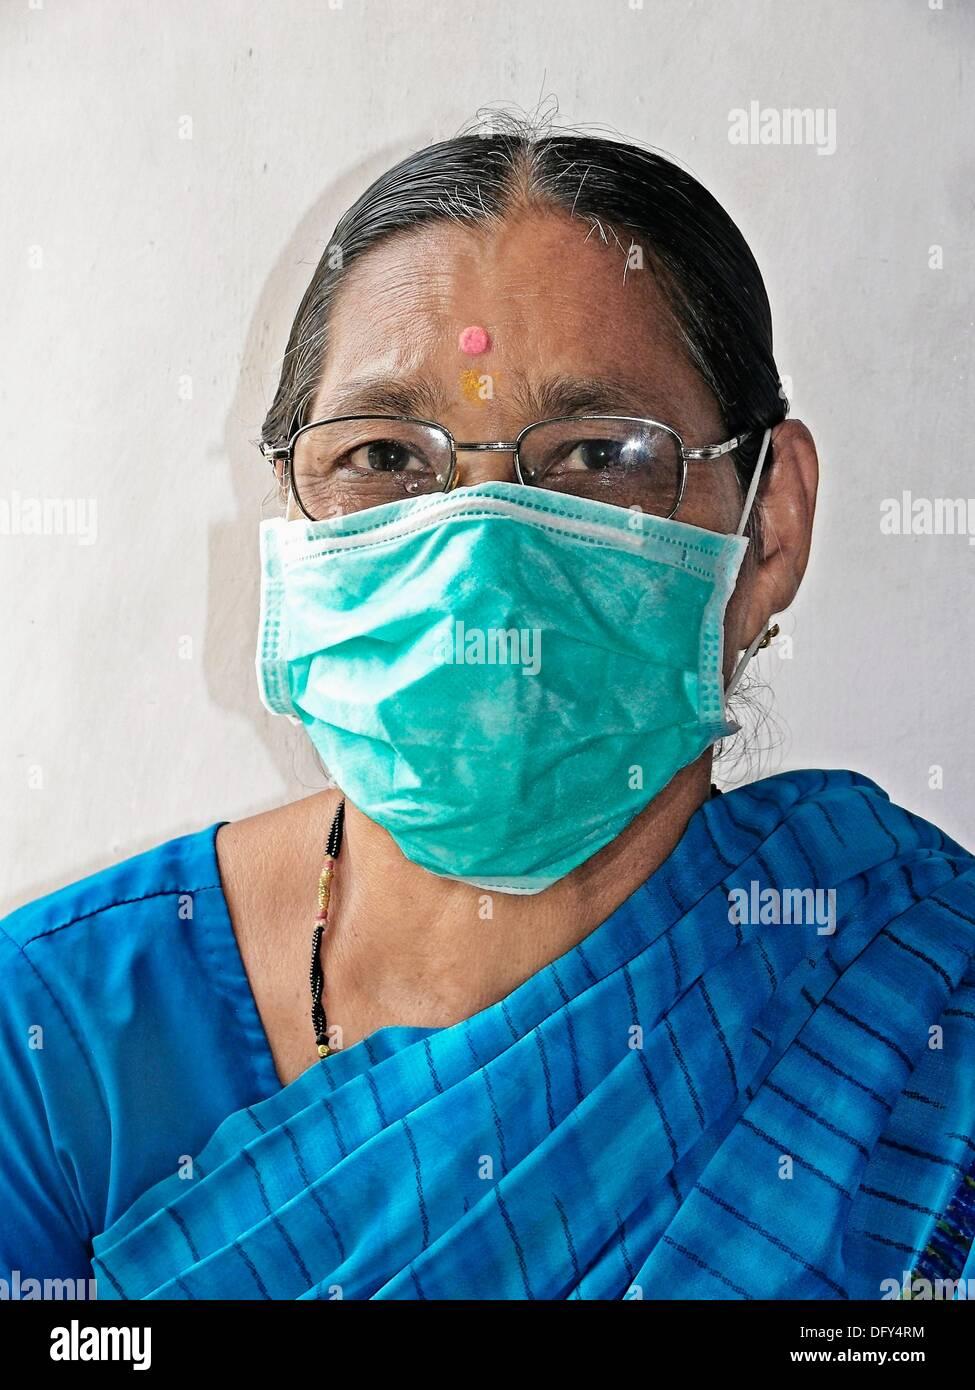 Adult Woman, Precaution mask for Swine Flu, H1N1 - Stock Image